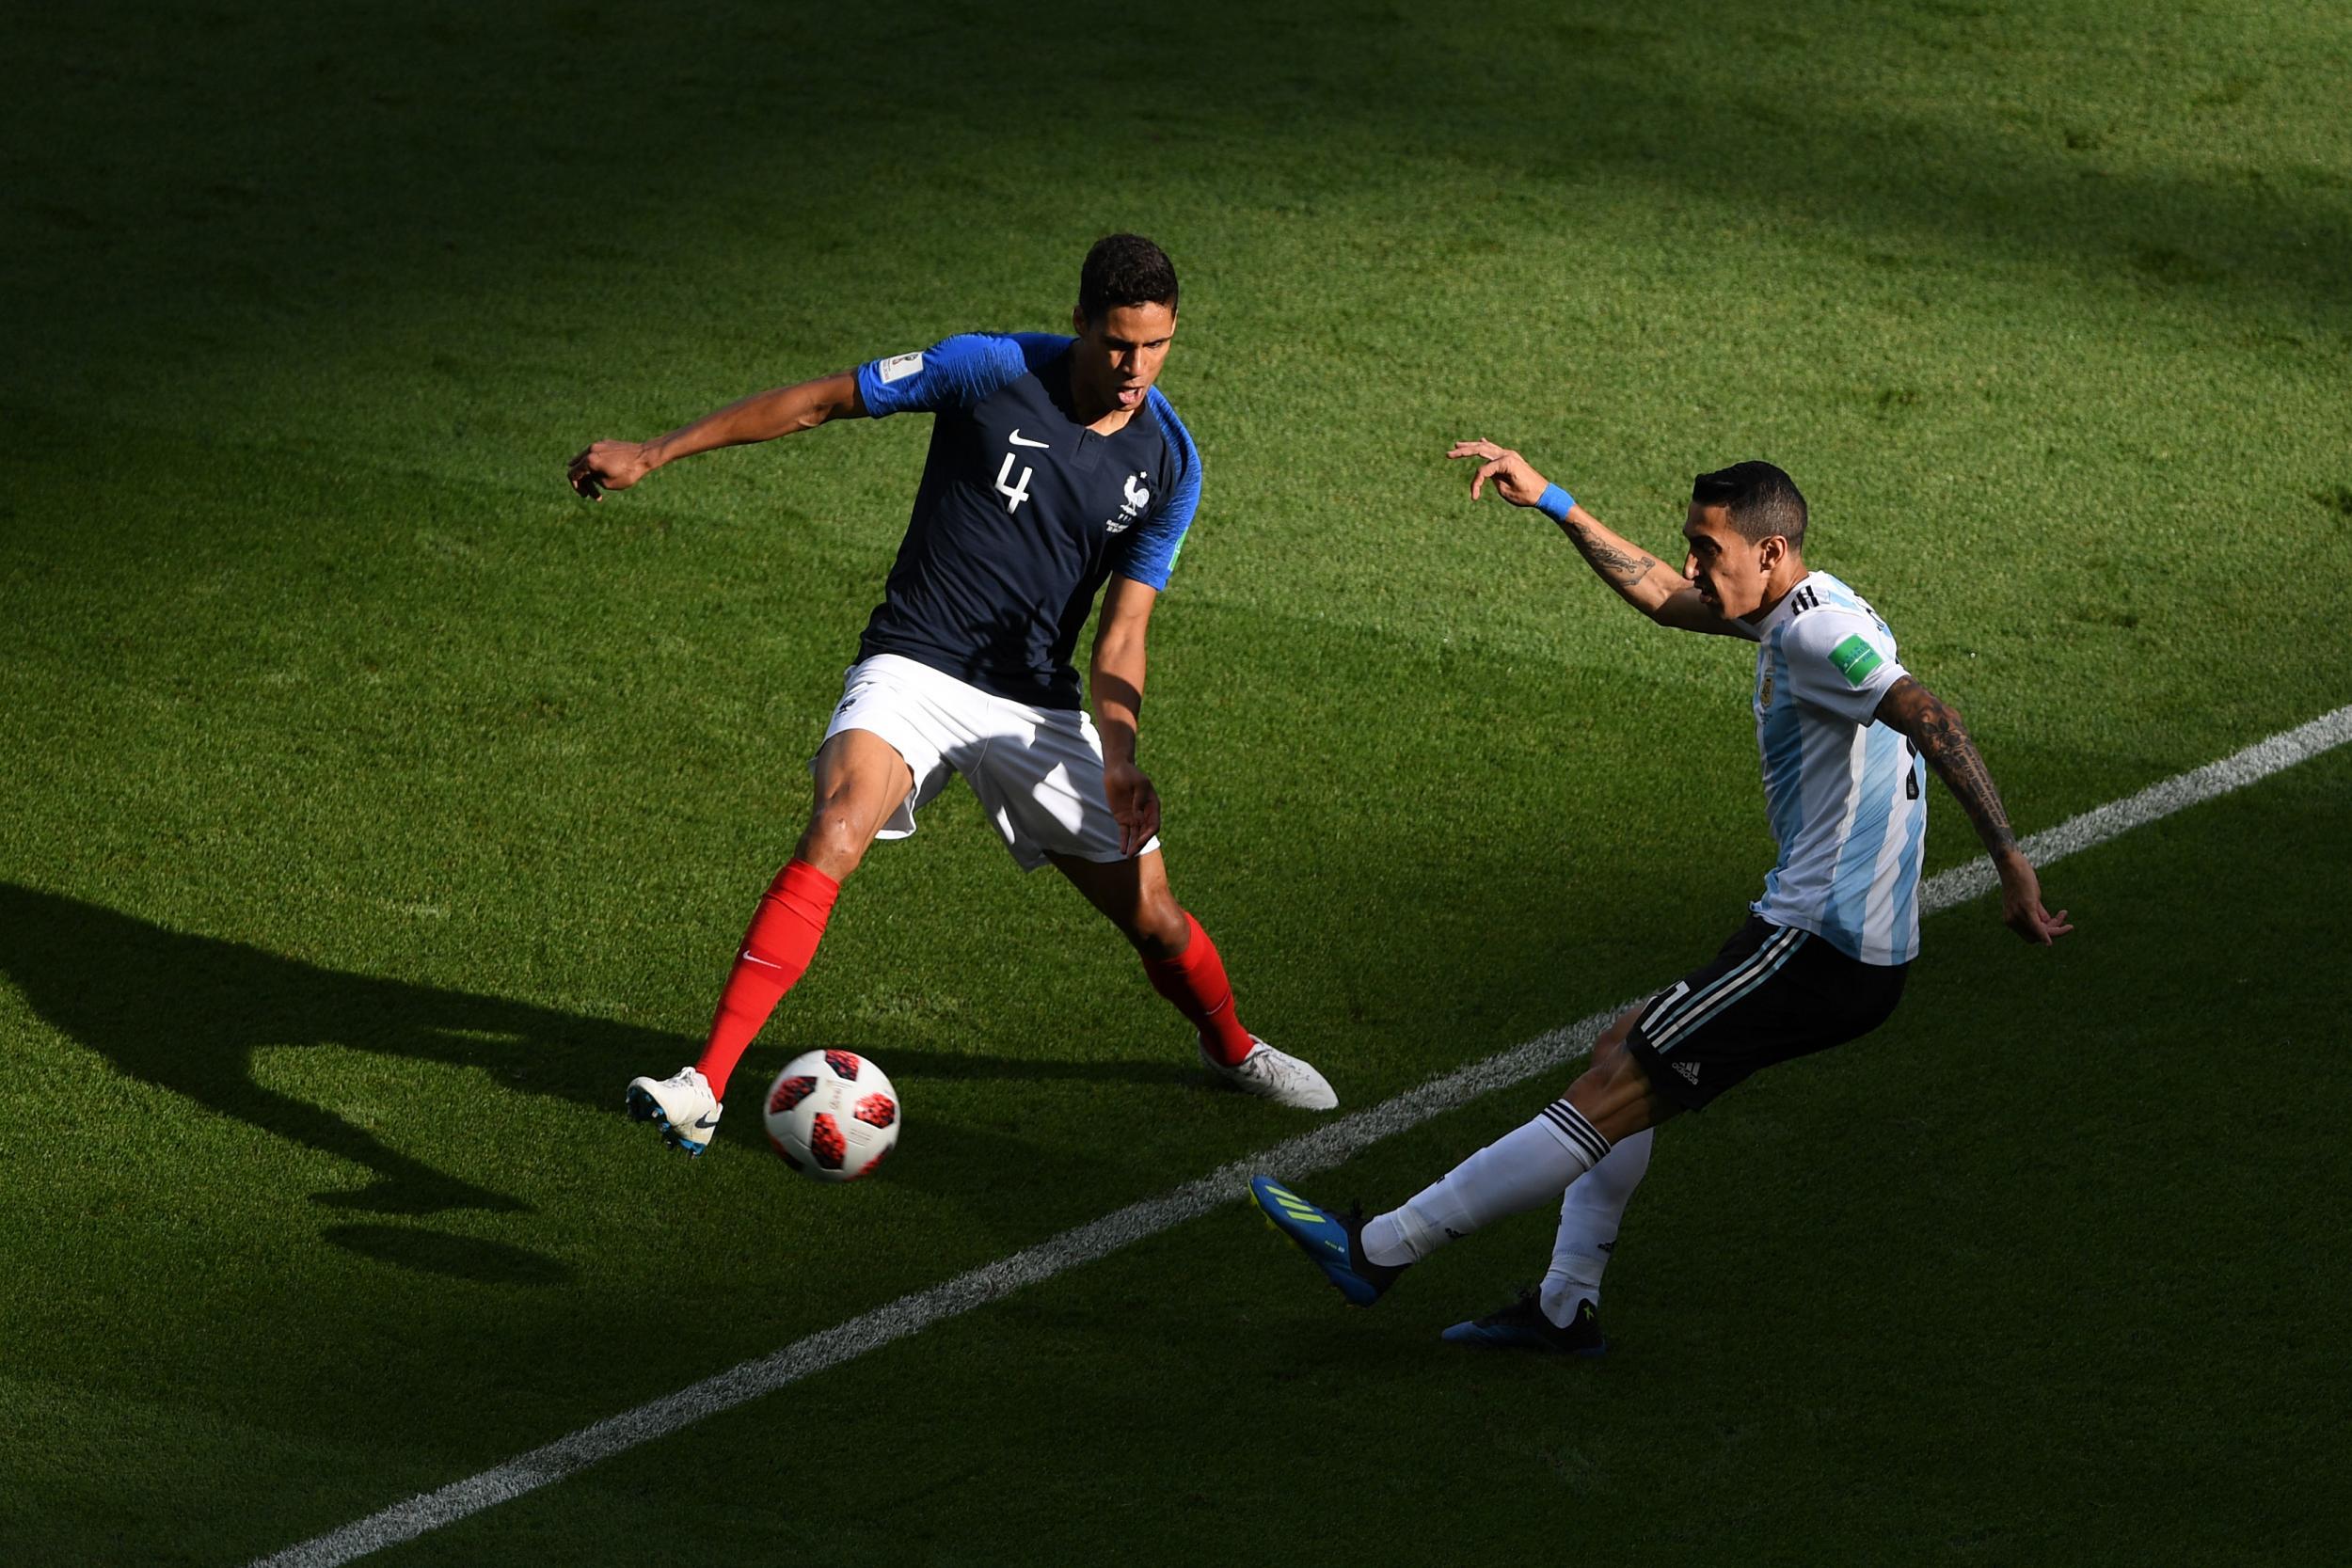 World Cup 2018: How Blaise Matuidi laid the platform for